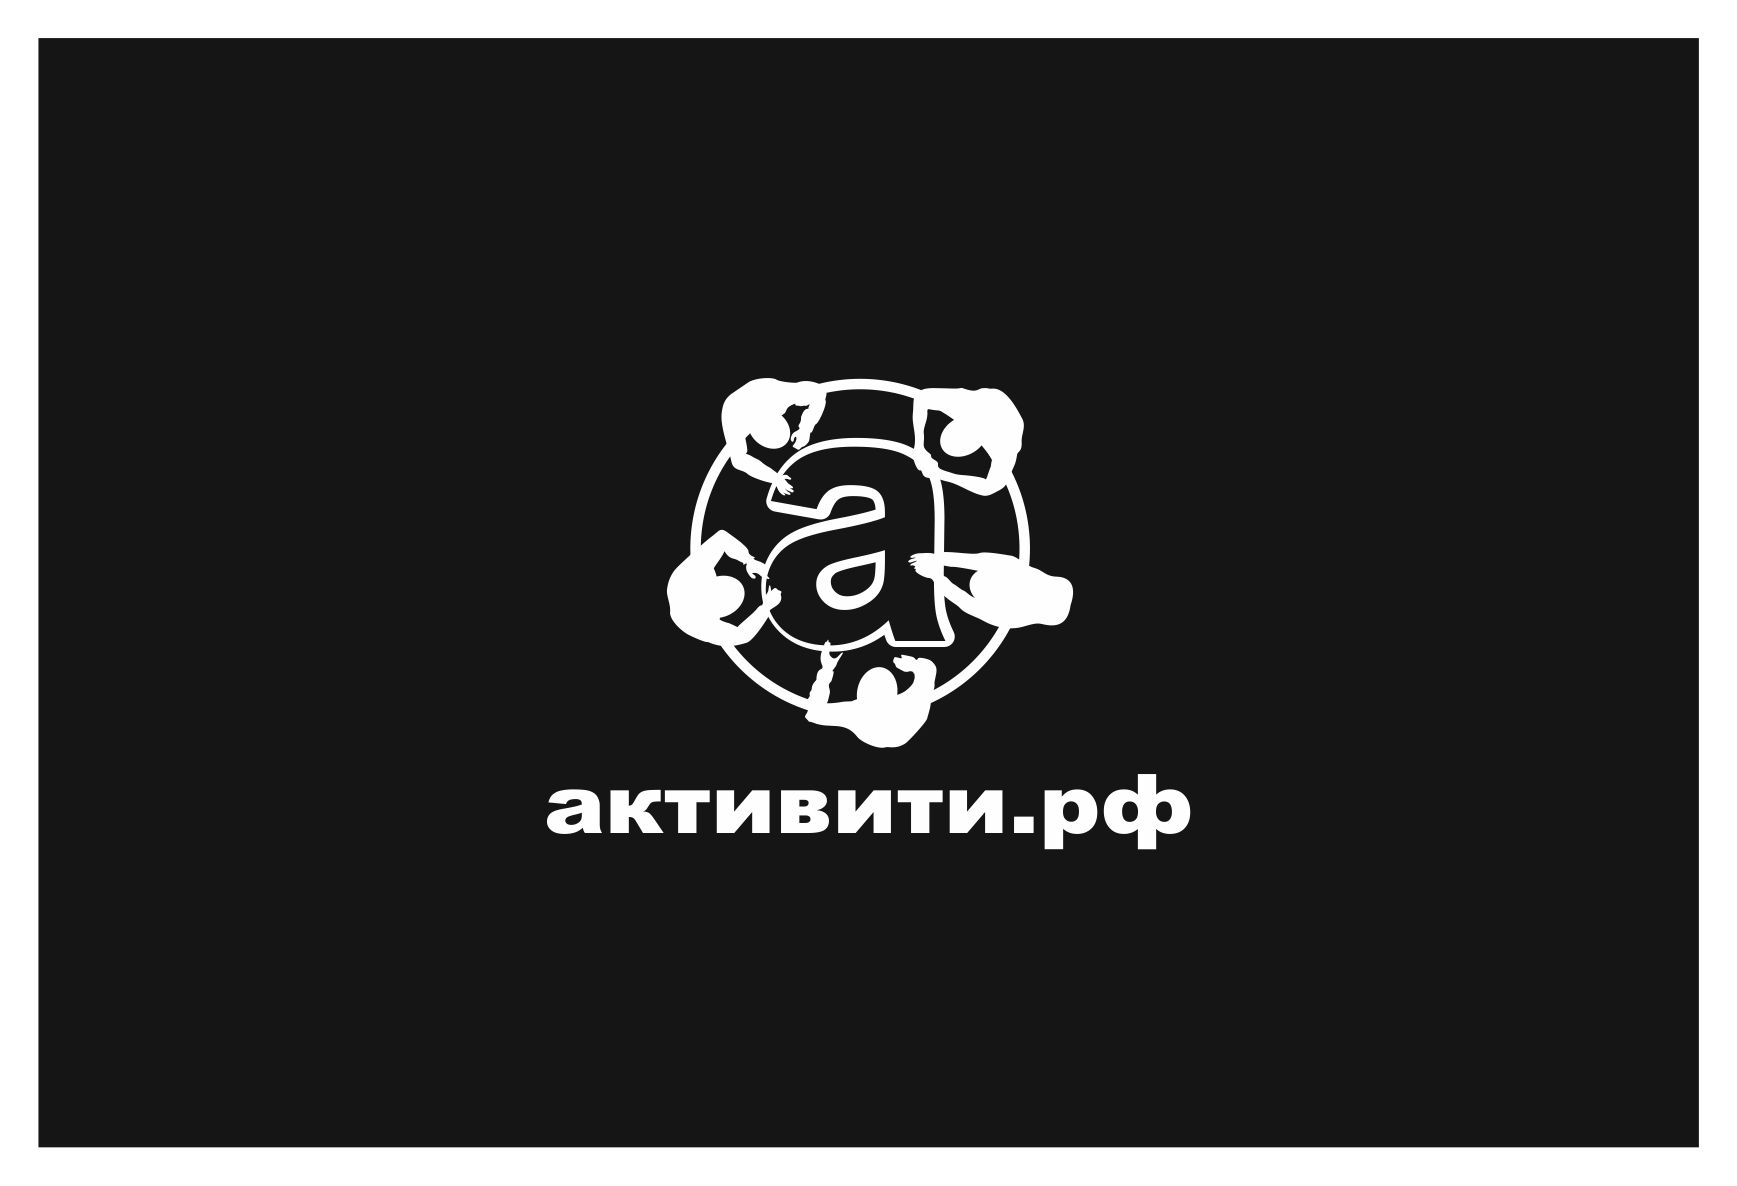 Логотип магазина активити.рф - дизайнер zooosad